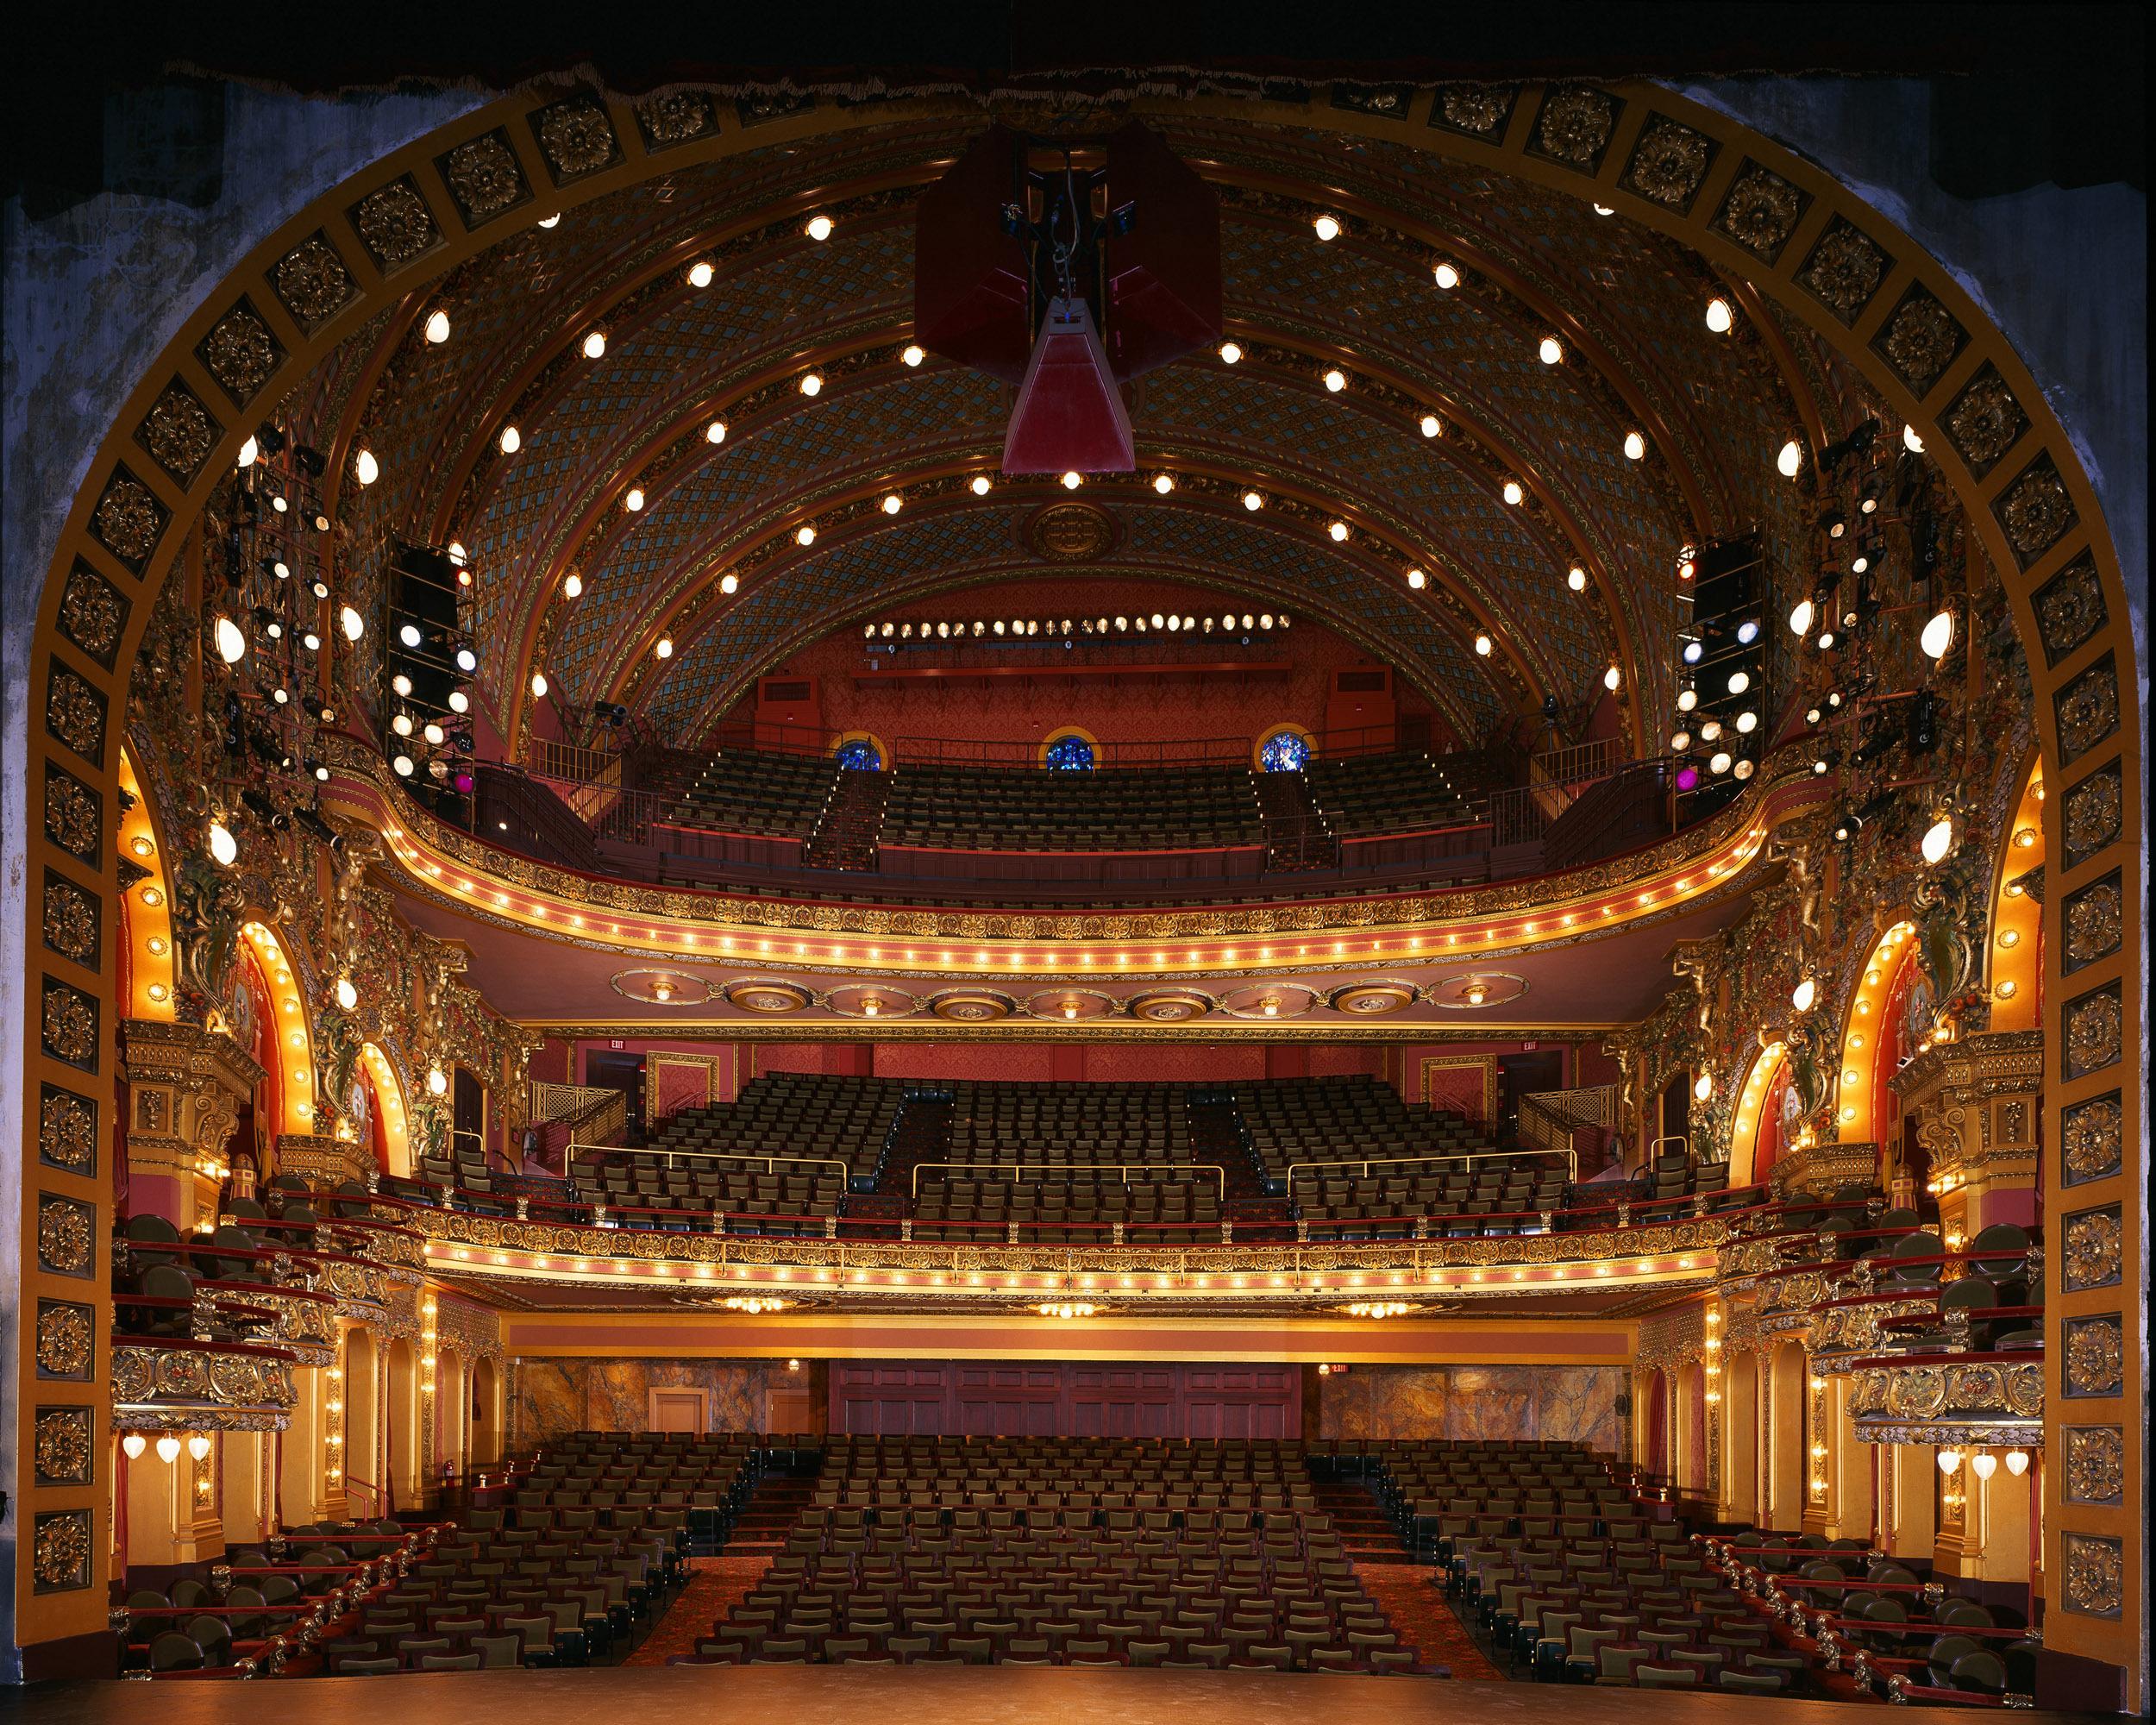 Emerson Cutler Majestic Theatre, Boston: Tickets, Schedule, Seating ...